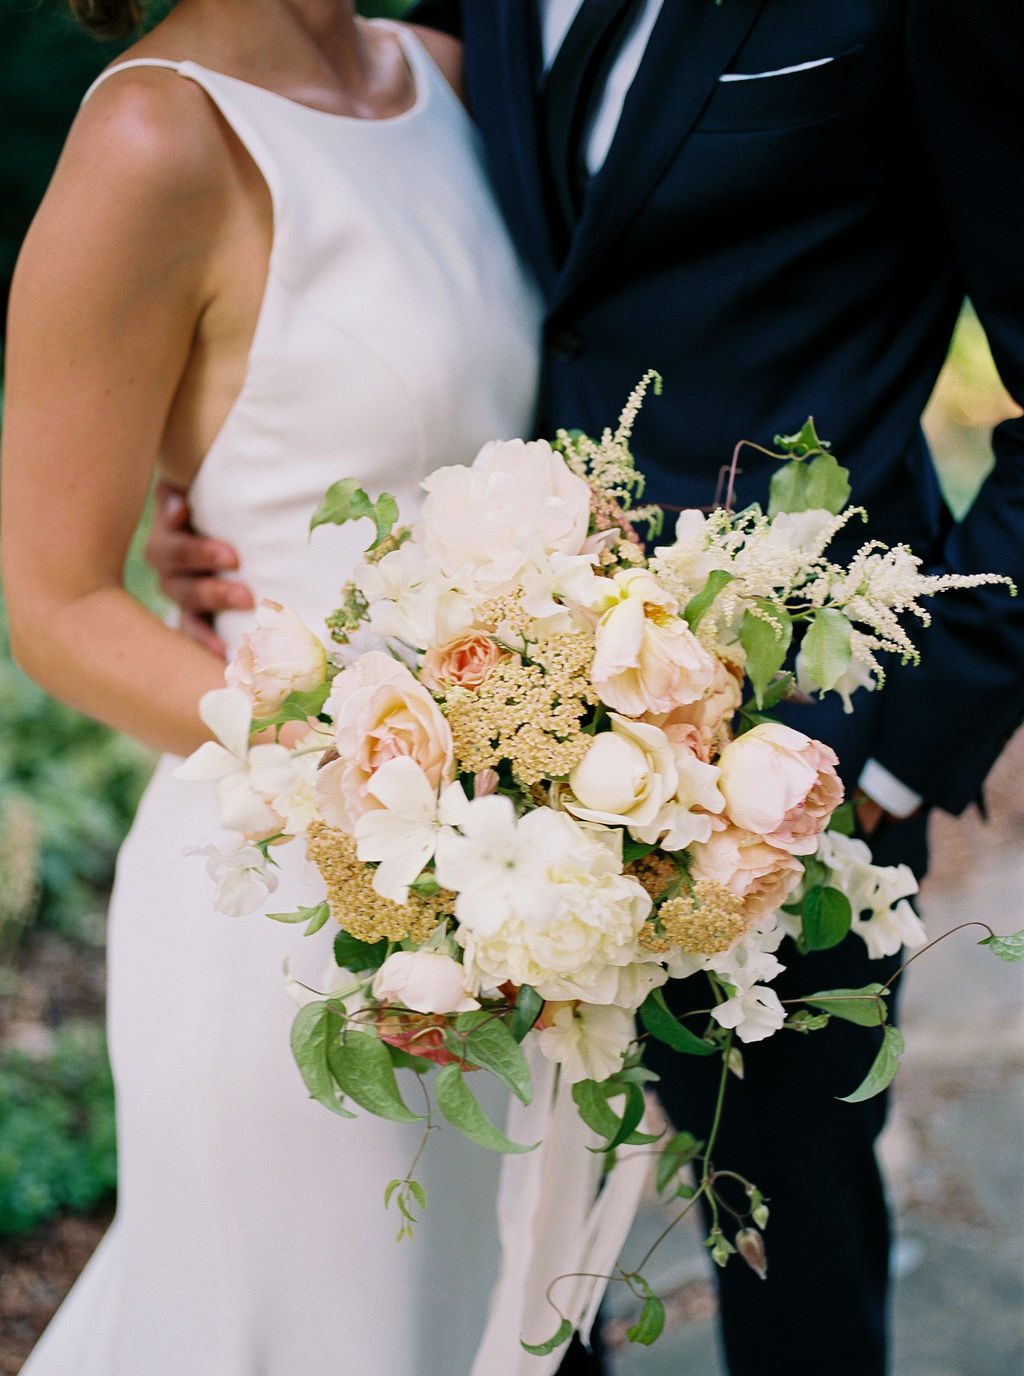 Alexandra-Elise-Photography-Film-Wedding-Photographer-Sonnenberg-Gardens-Finger-Lakes-Canandaigua-Bride-Groom-016.jpg